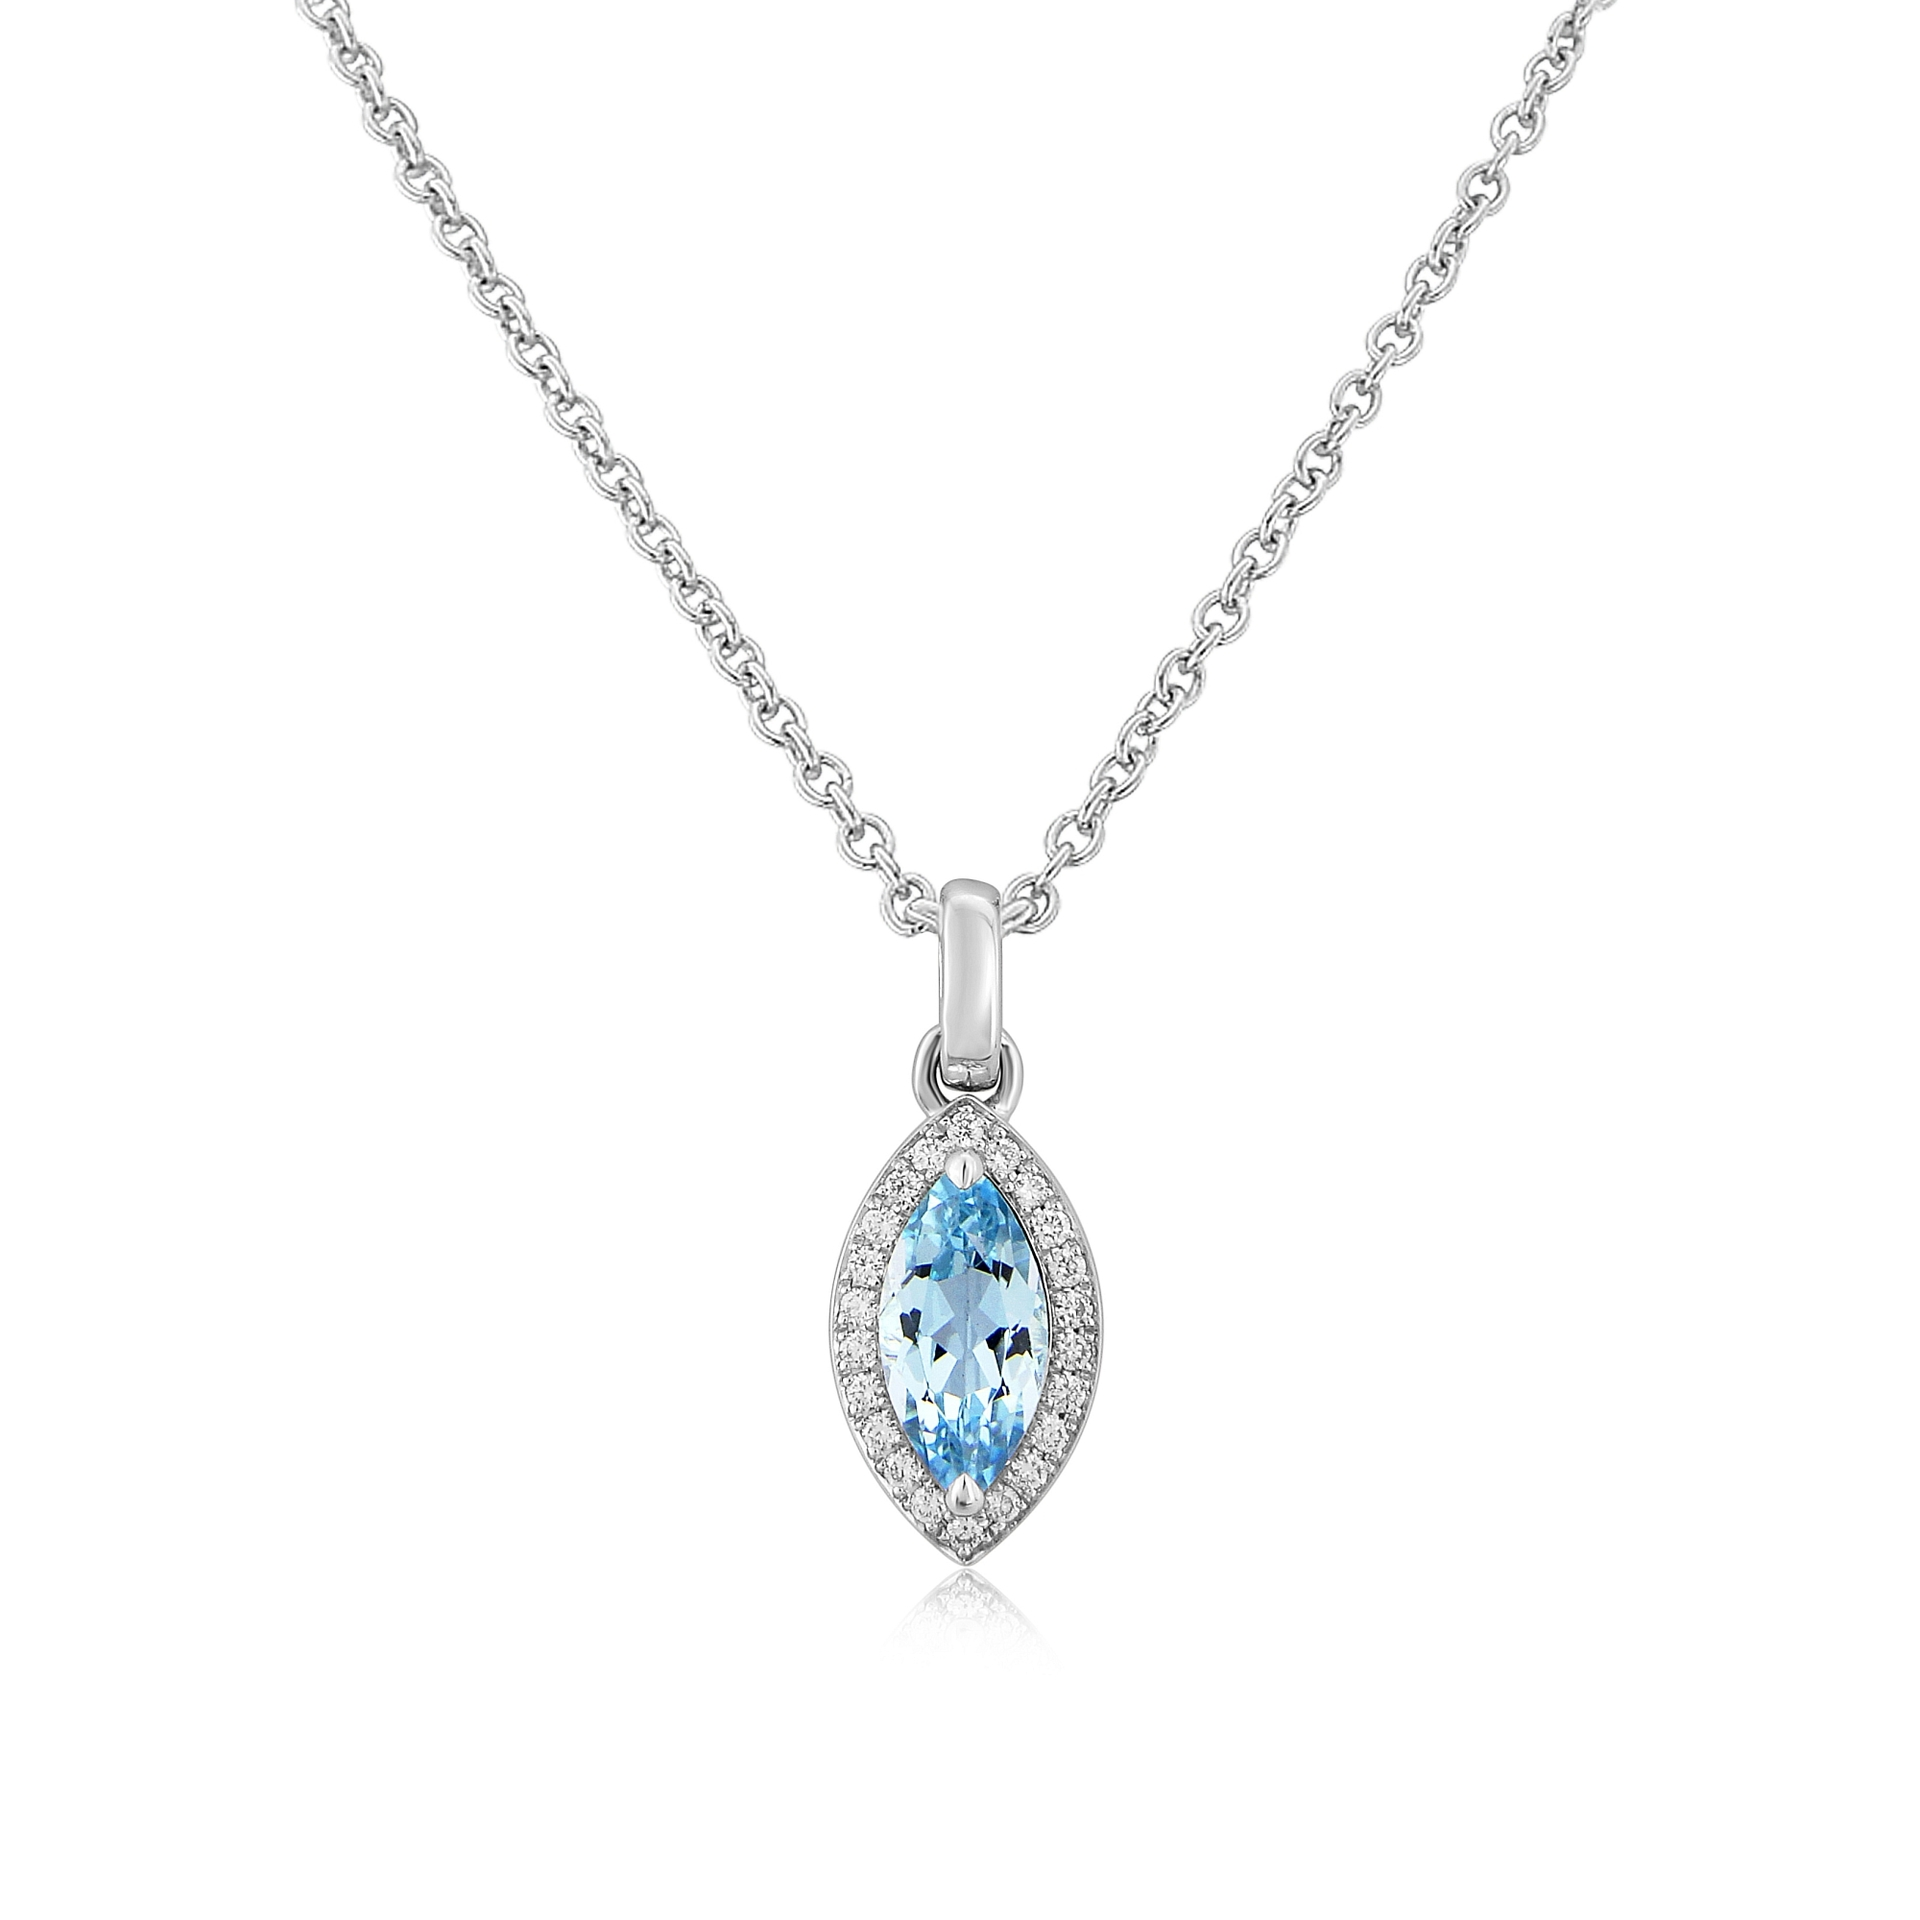 Twin Collection 9ct White Gold blue Topaz & Diamond Pendant